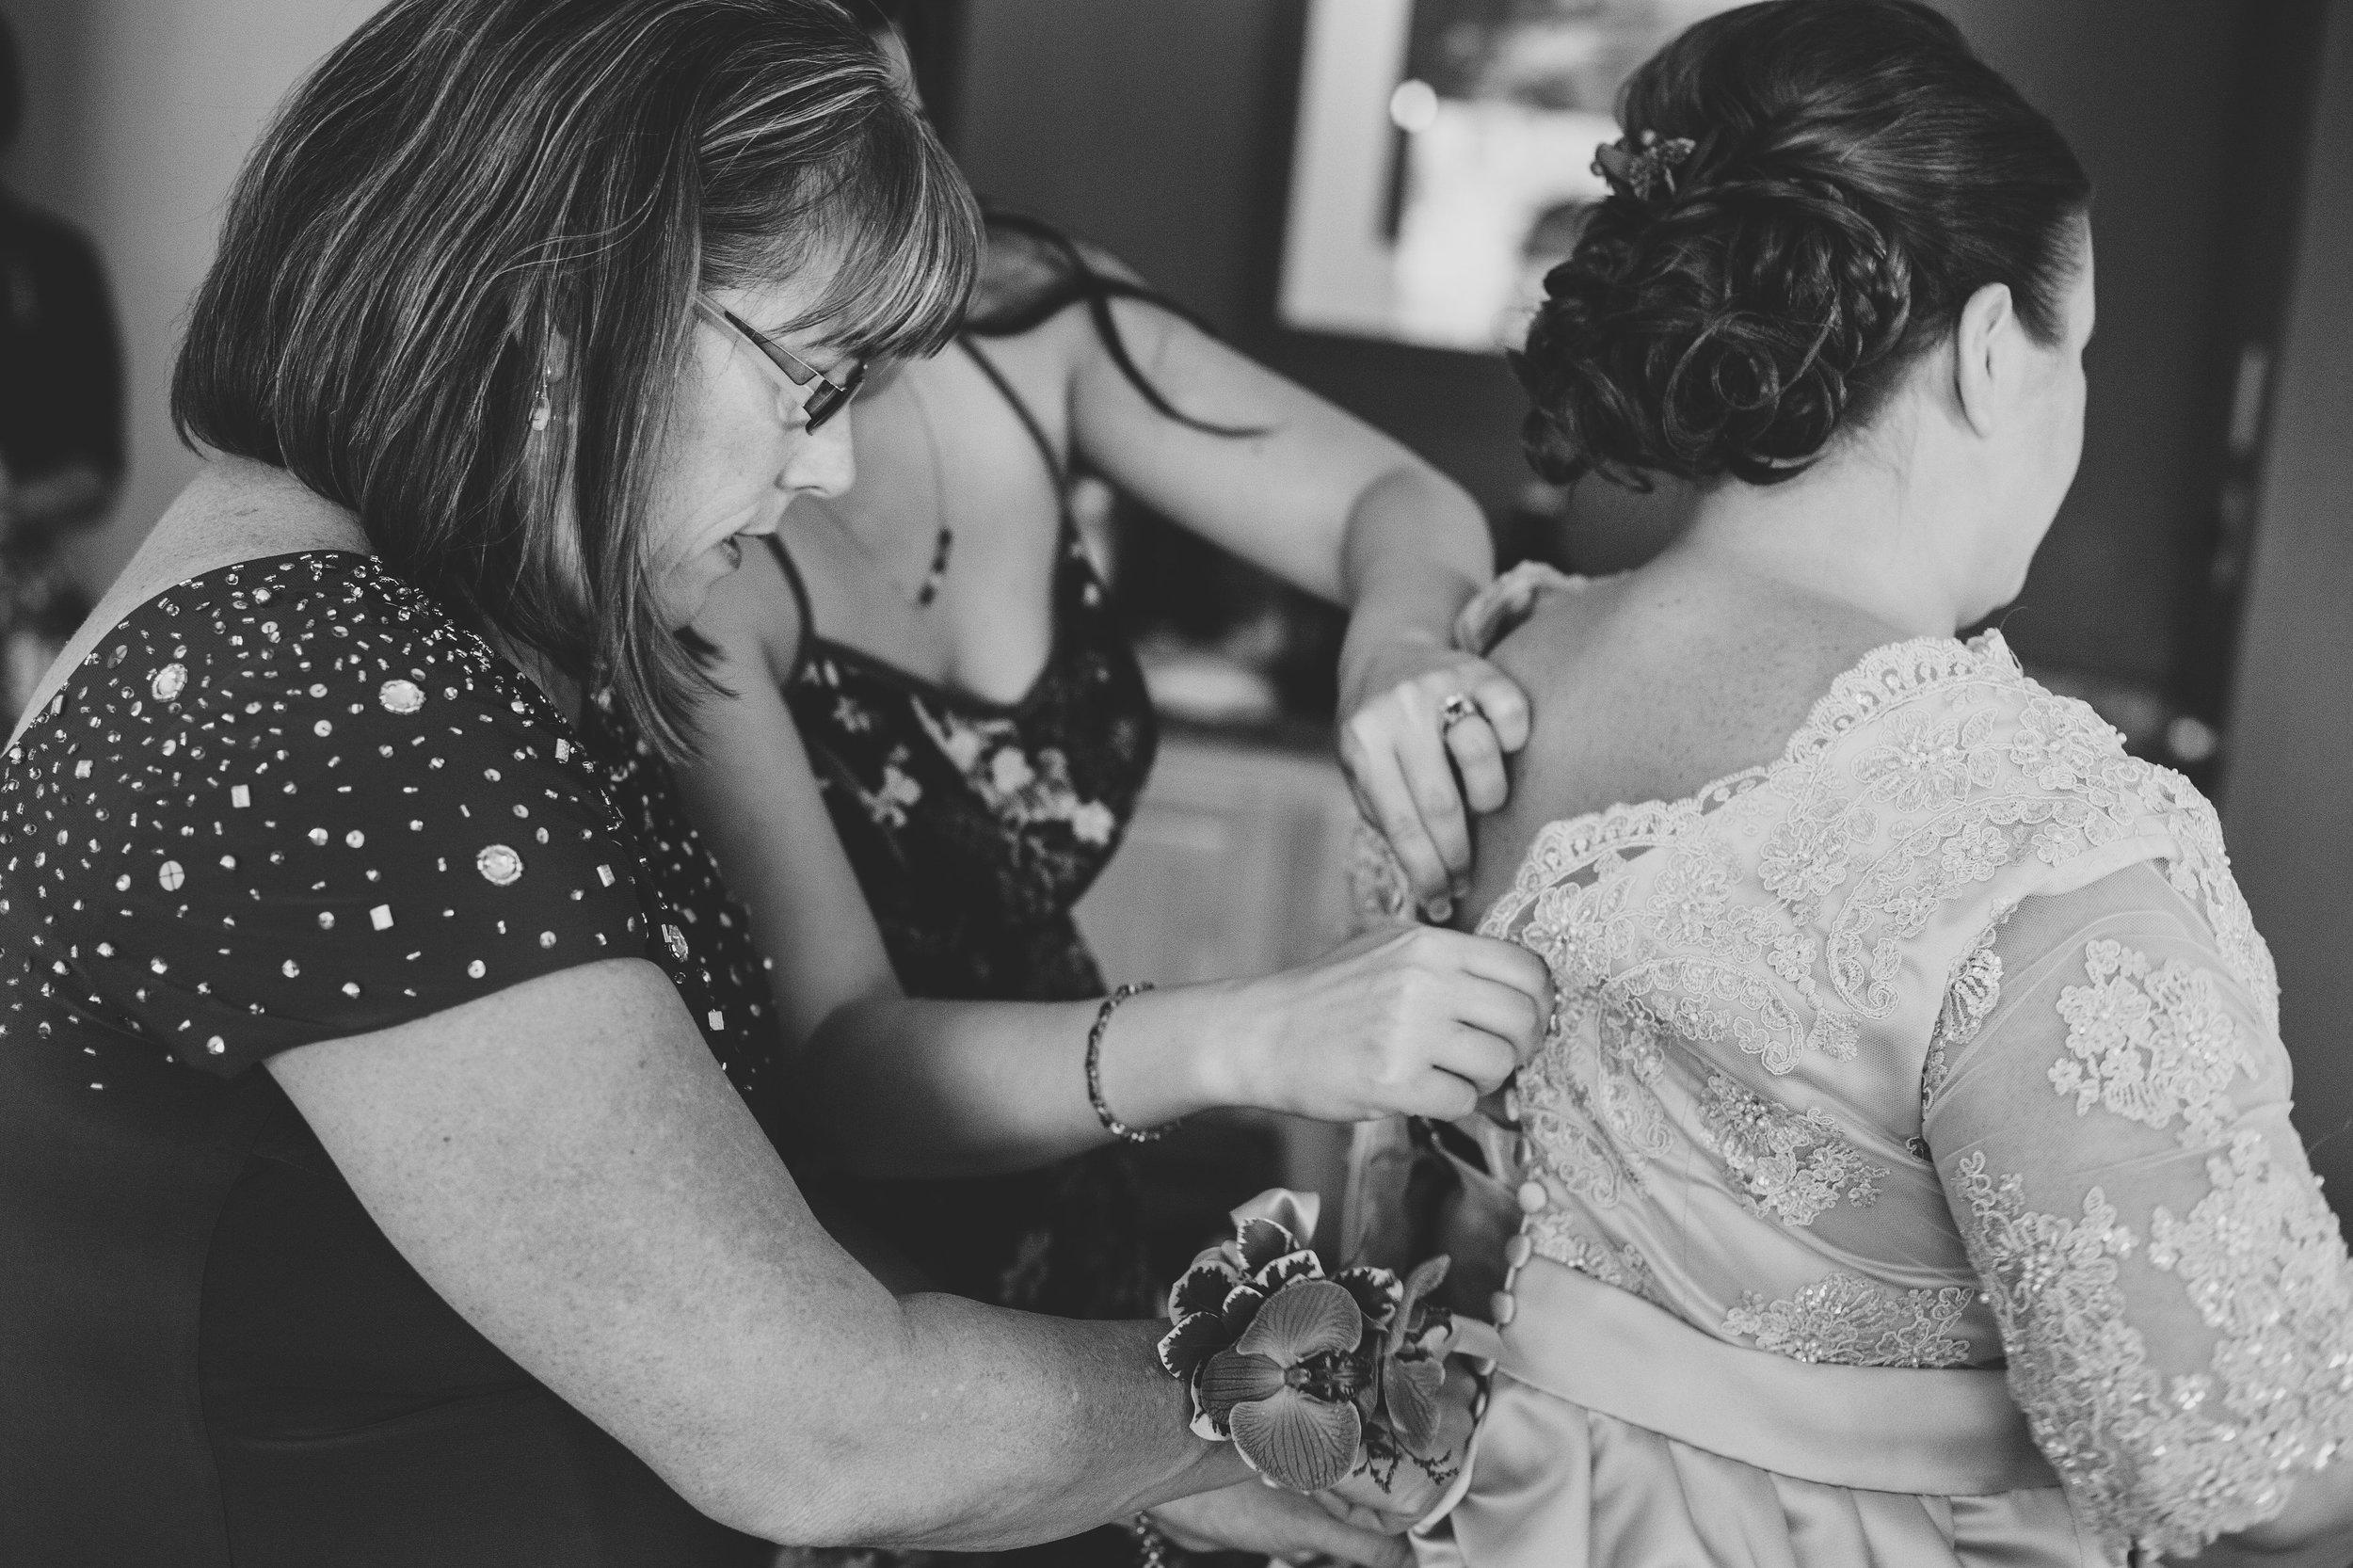 jessica-bride-getting-into-dress